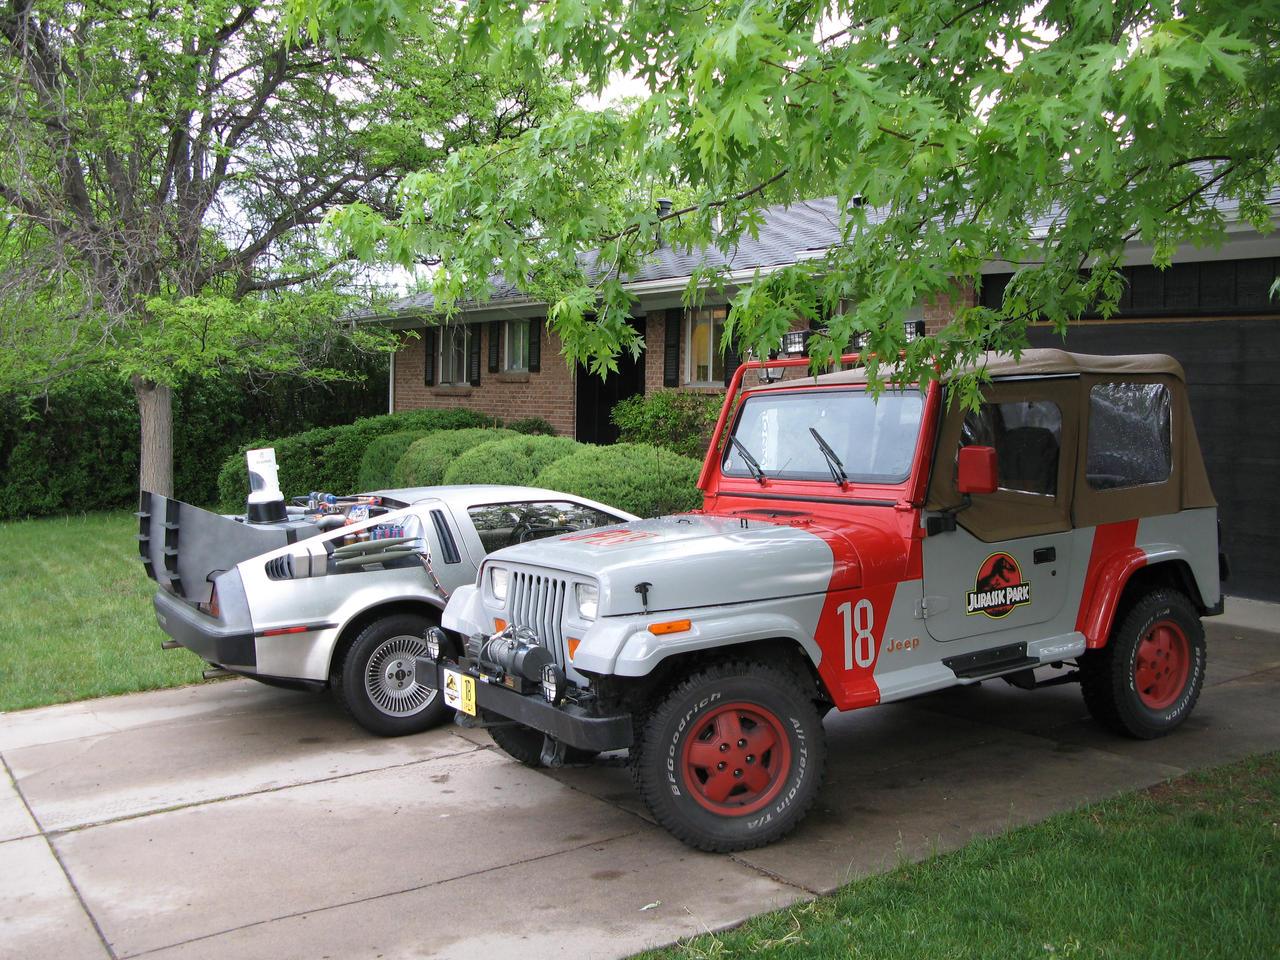 Jurassic Park Jeep Wrangler 32 by Boomerjinks